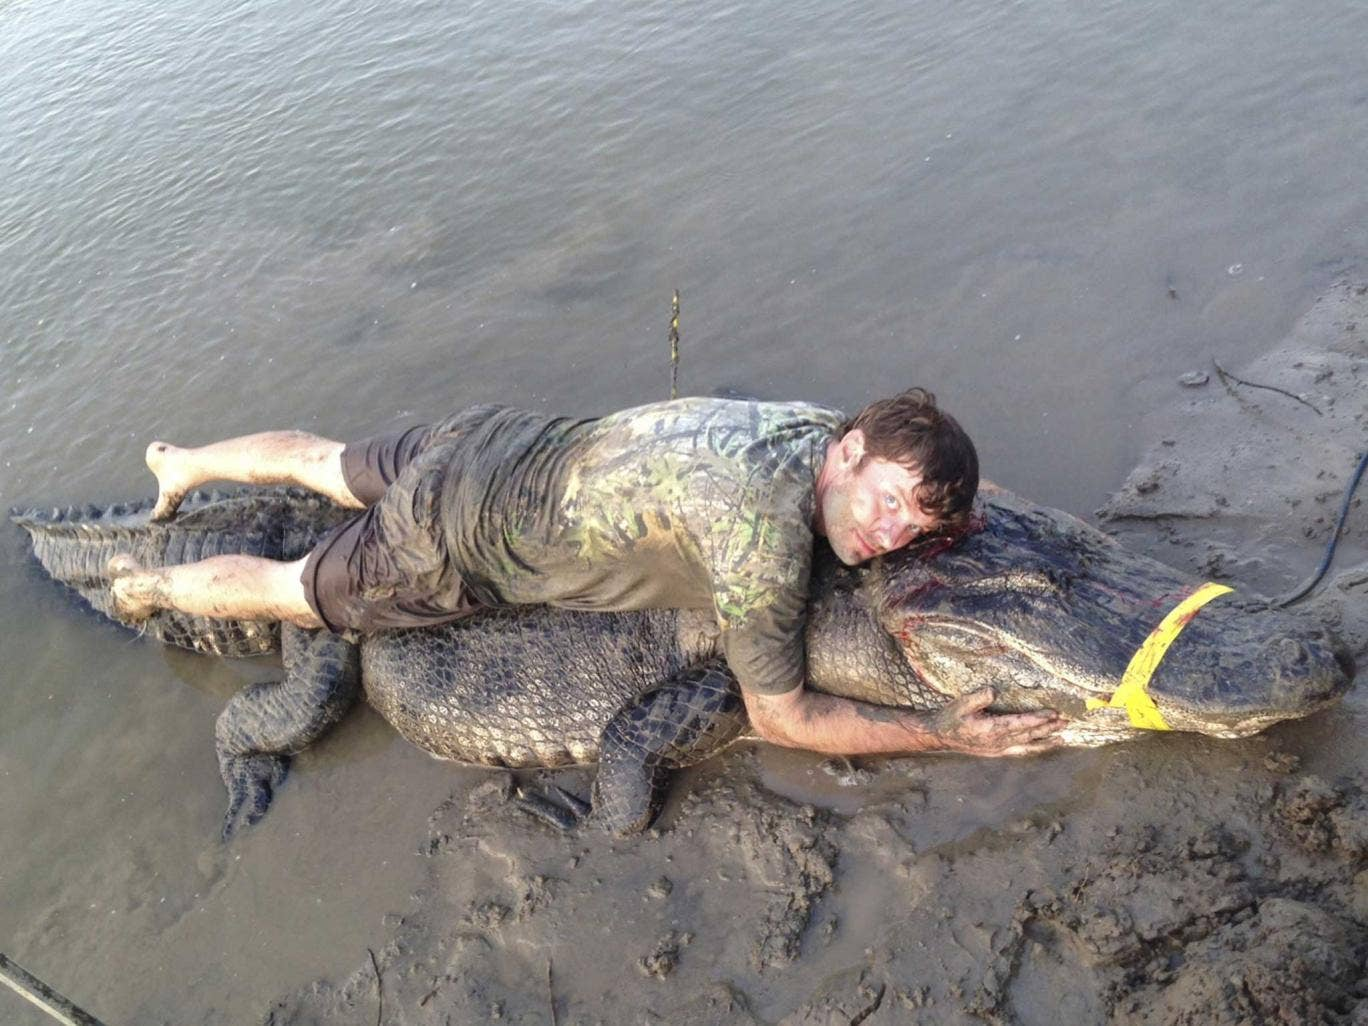 Dustin Bockman lies on top of his record-breaking alligator